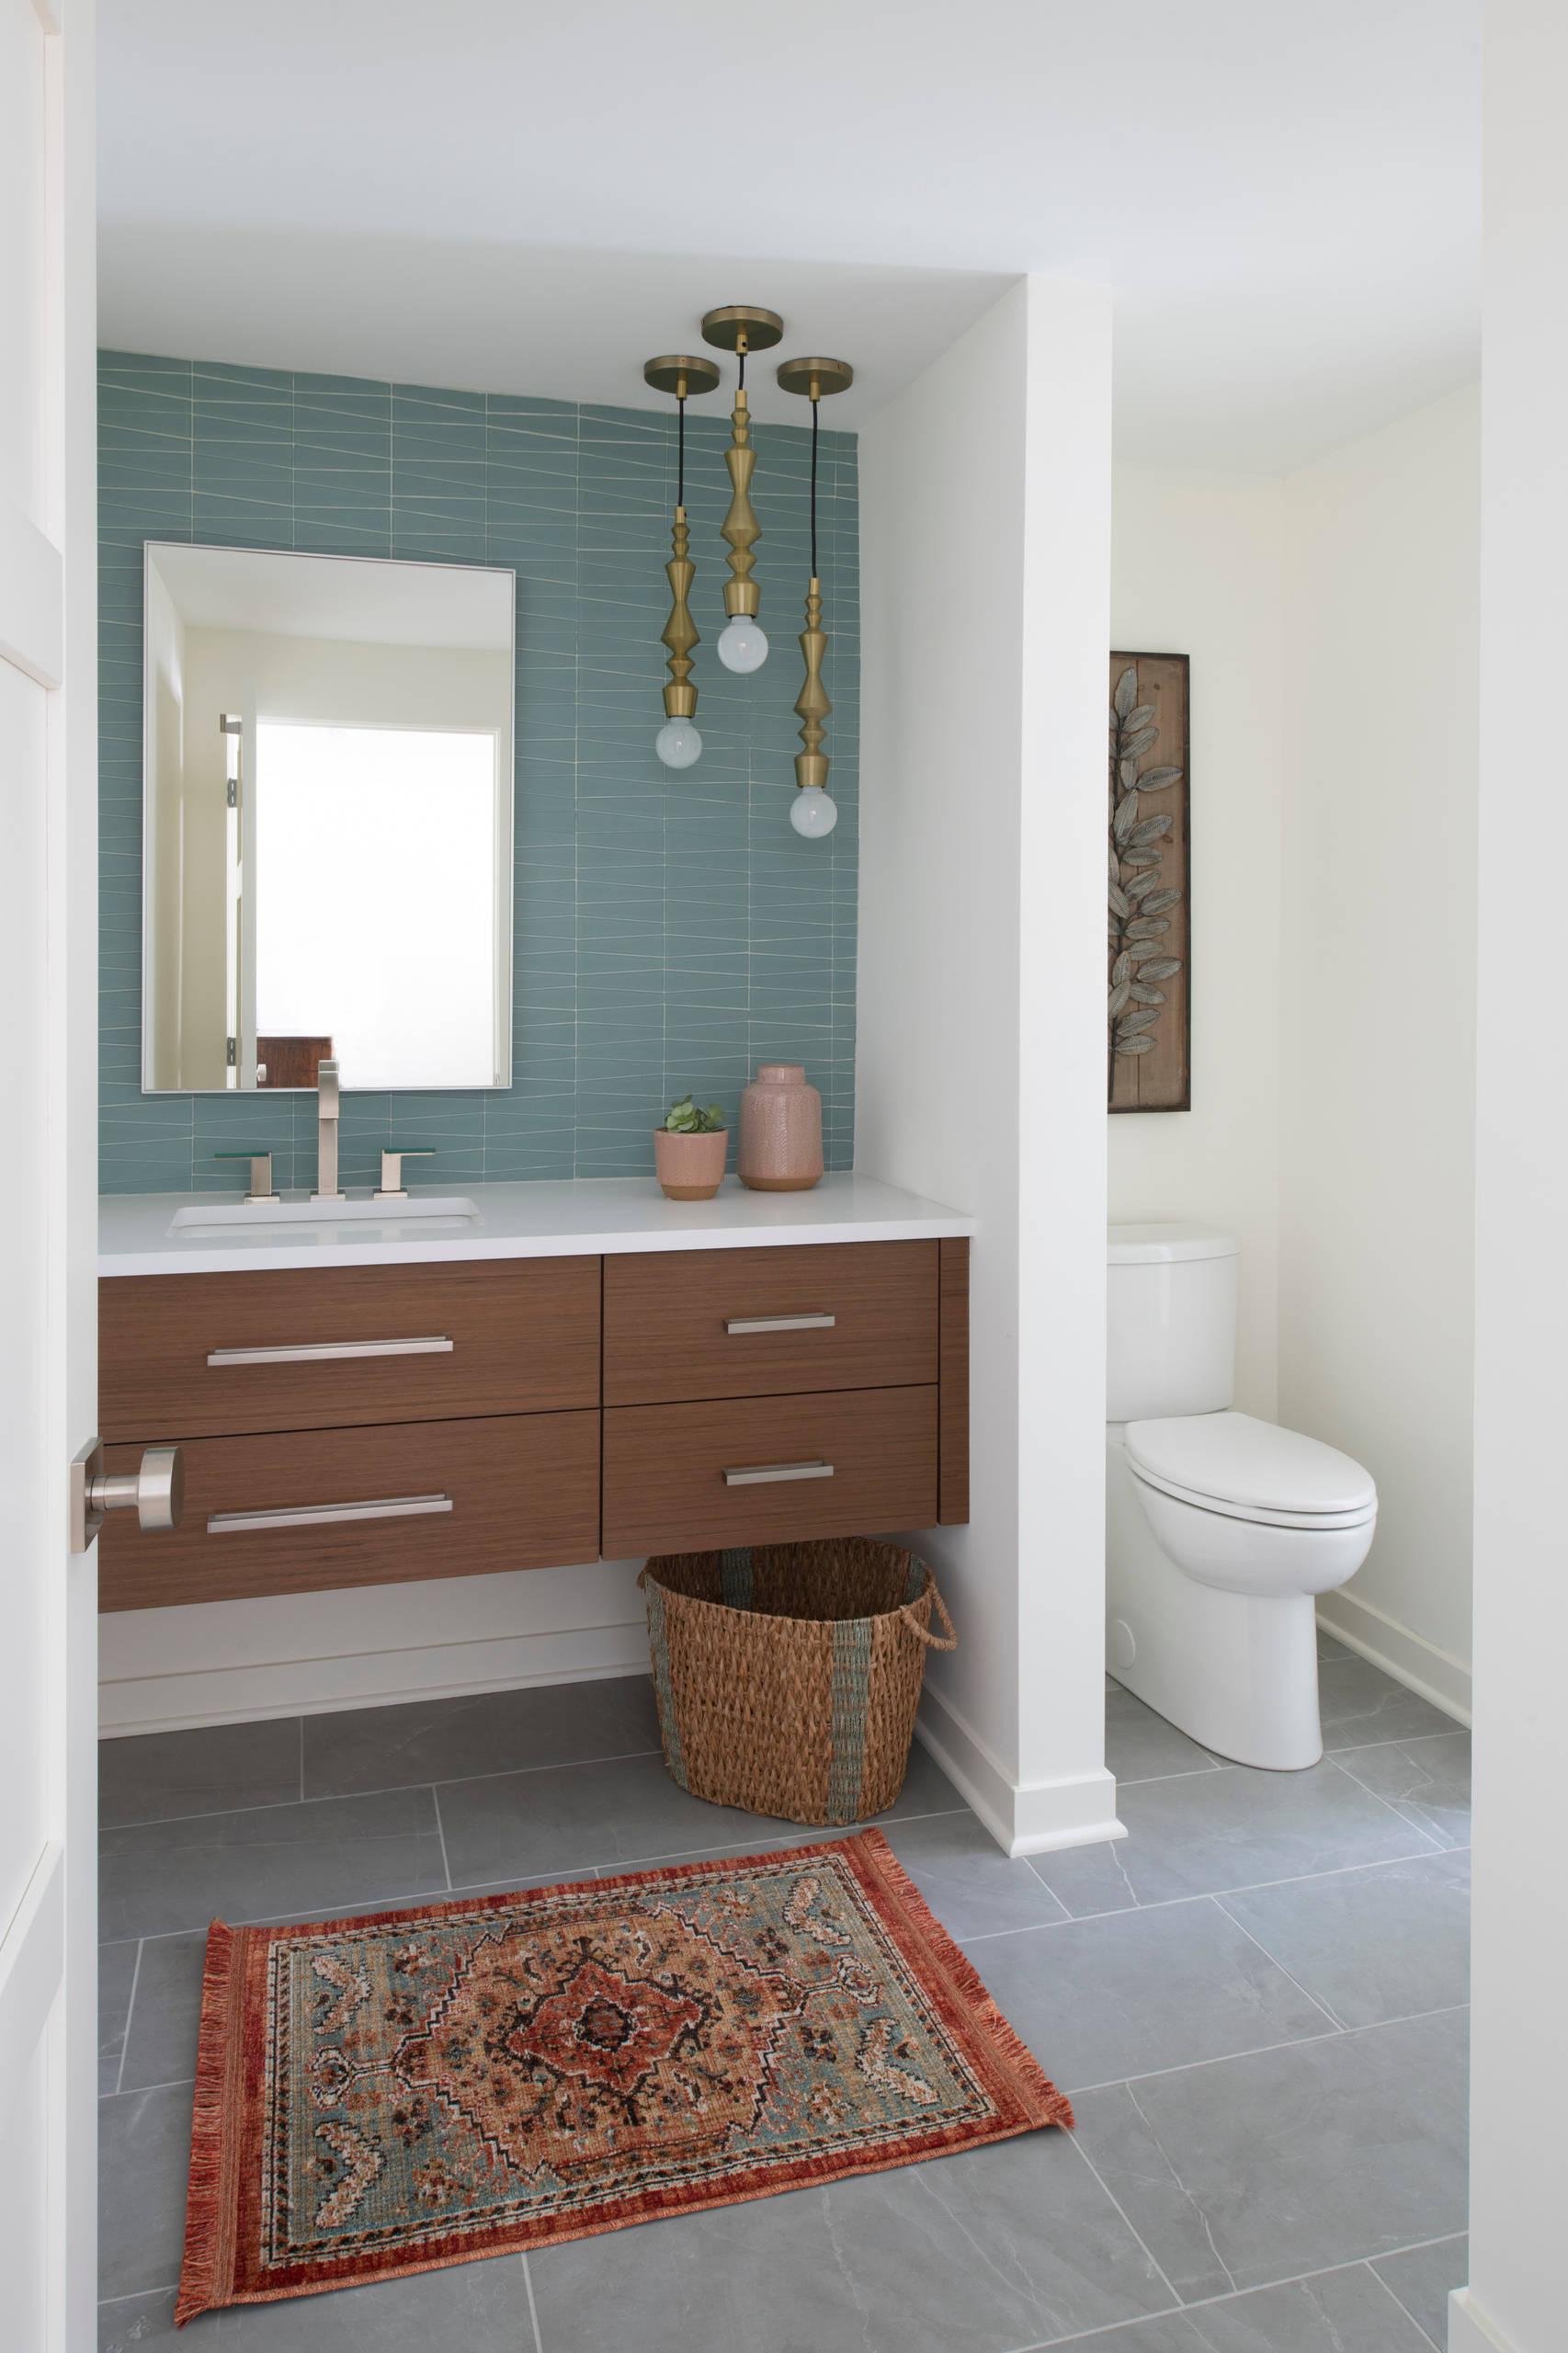 75 Beautiful Mid Century Modern Bathroom Pictures Ideas February 2021 Houzz